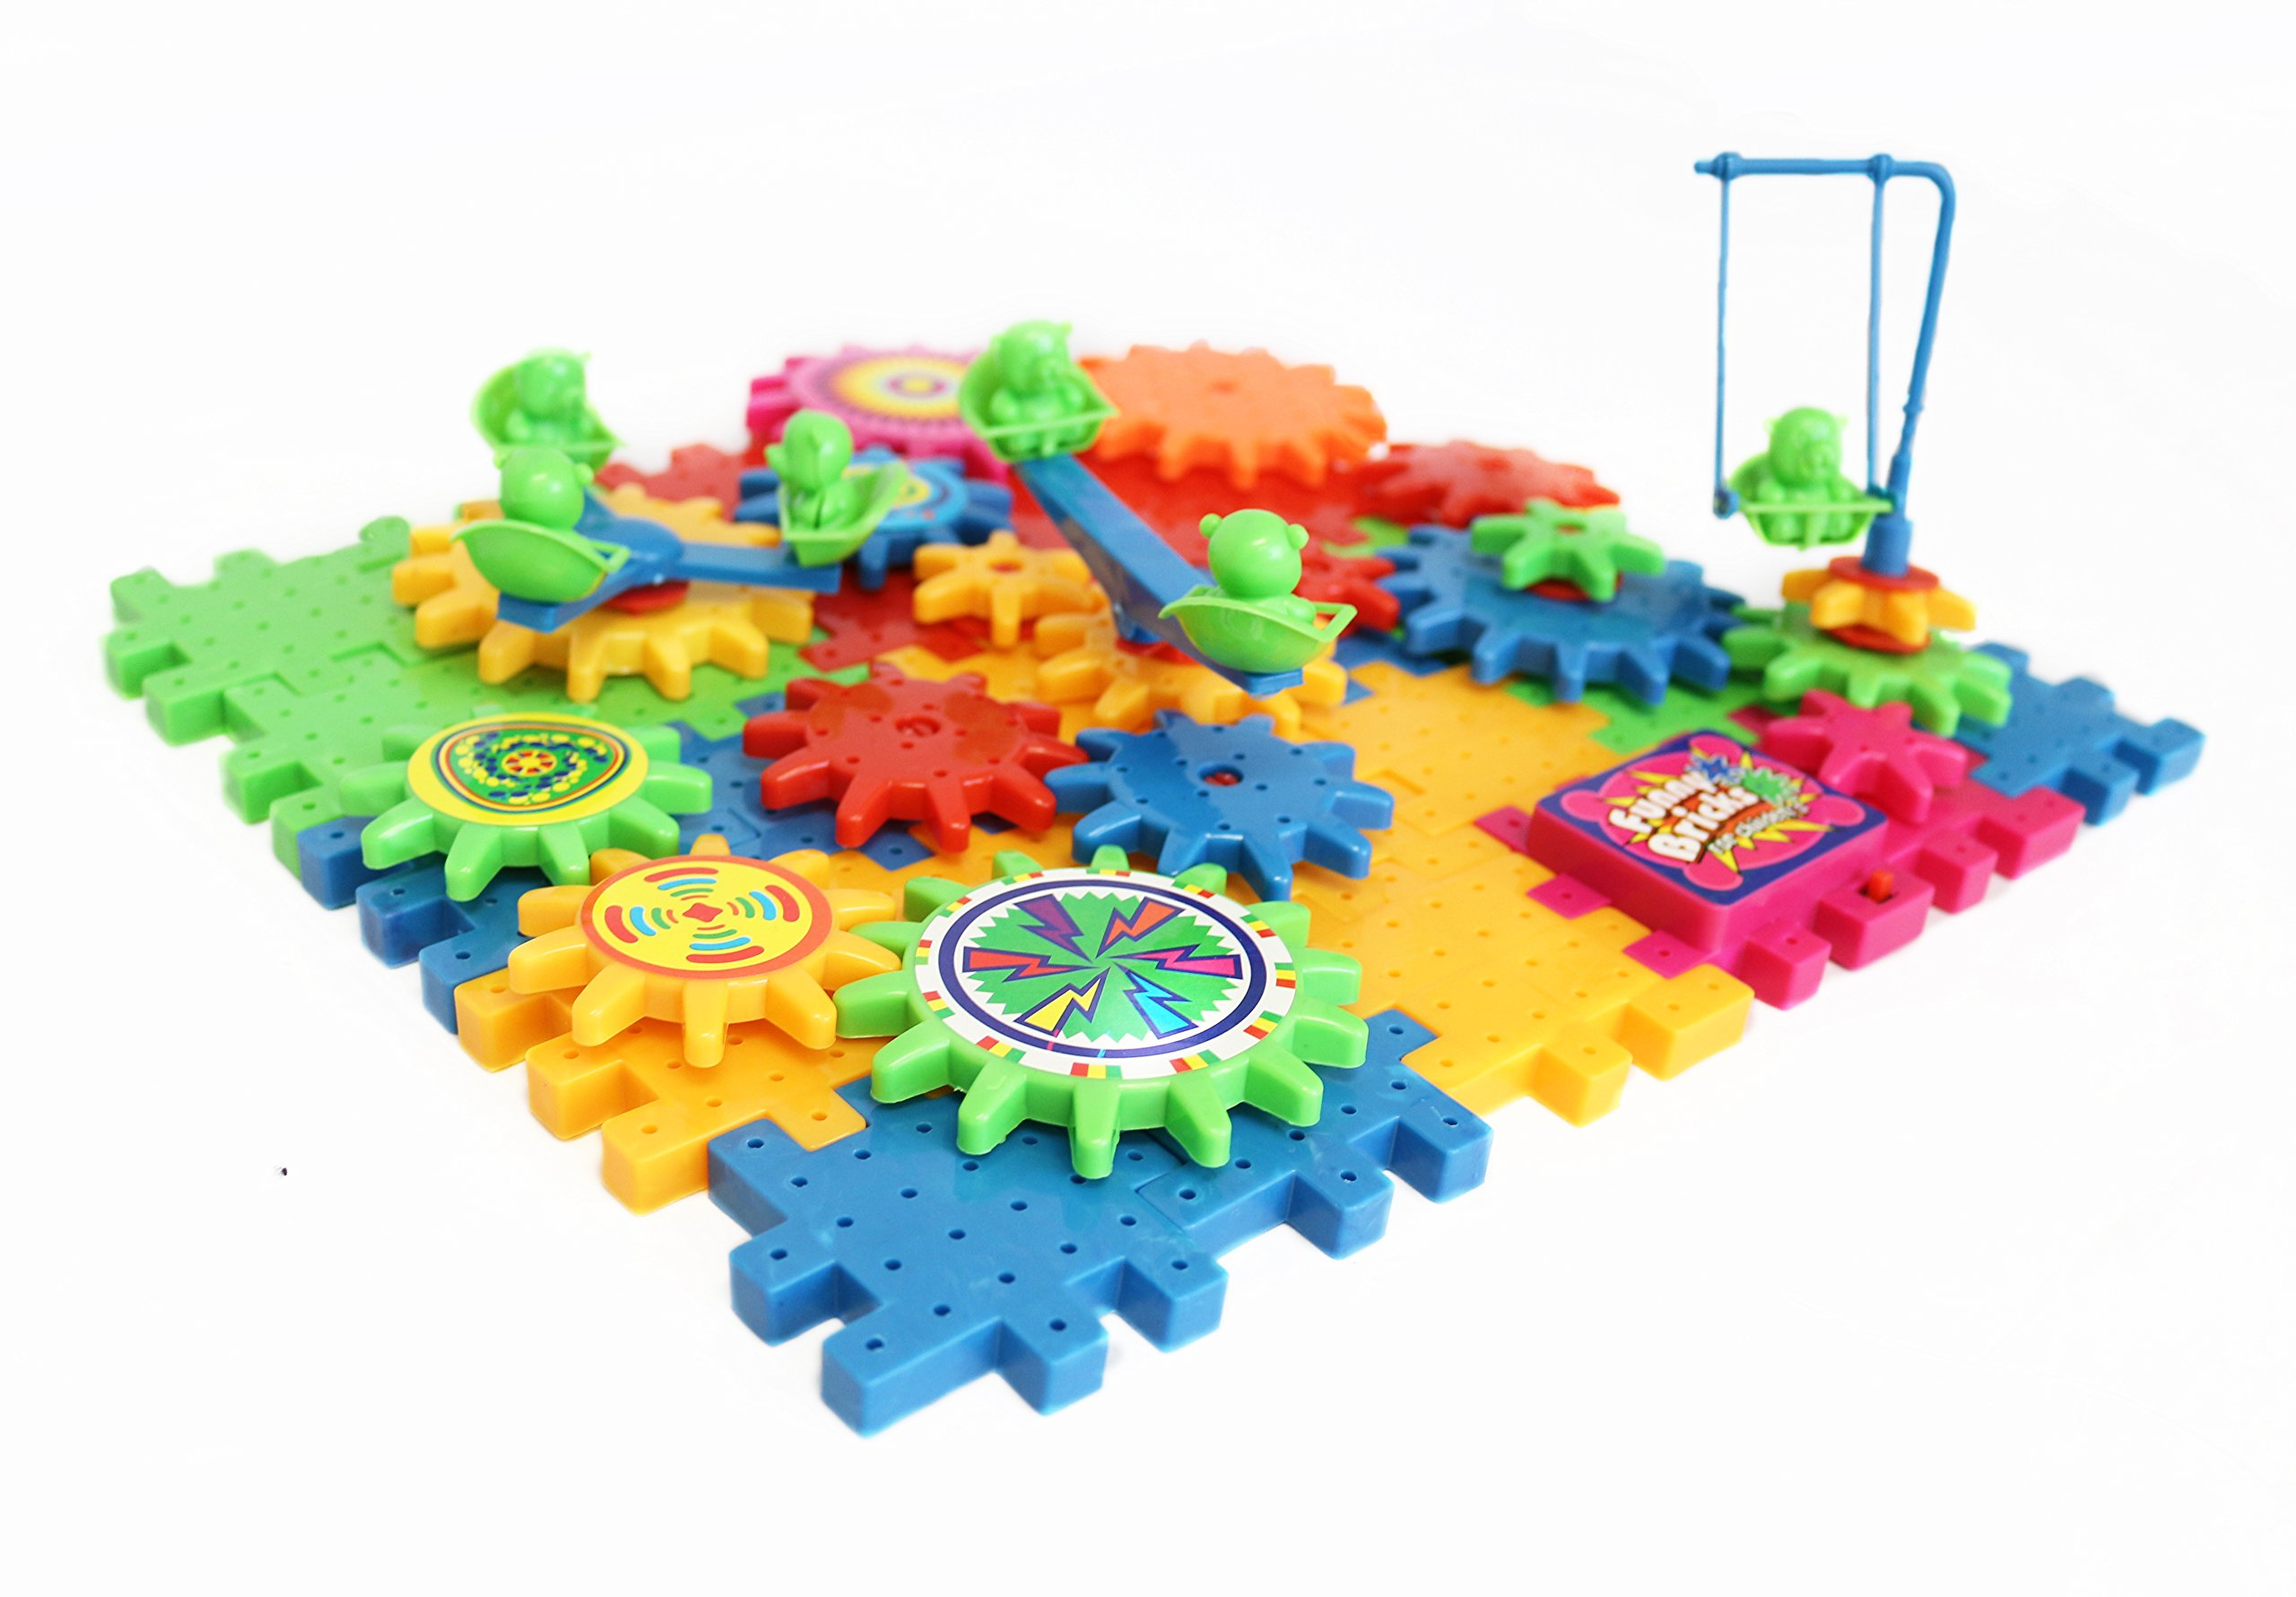 Cheap Educational Toys : Buy educational toy gear set fine motor skills toys educational